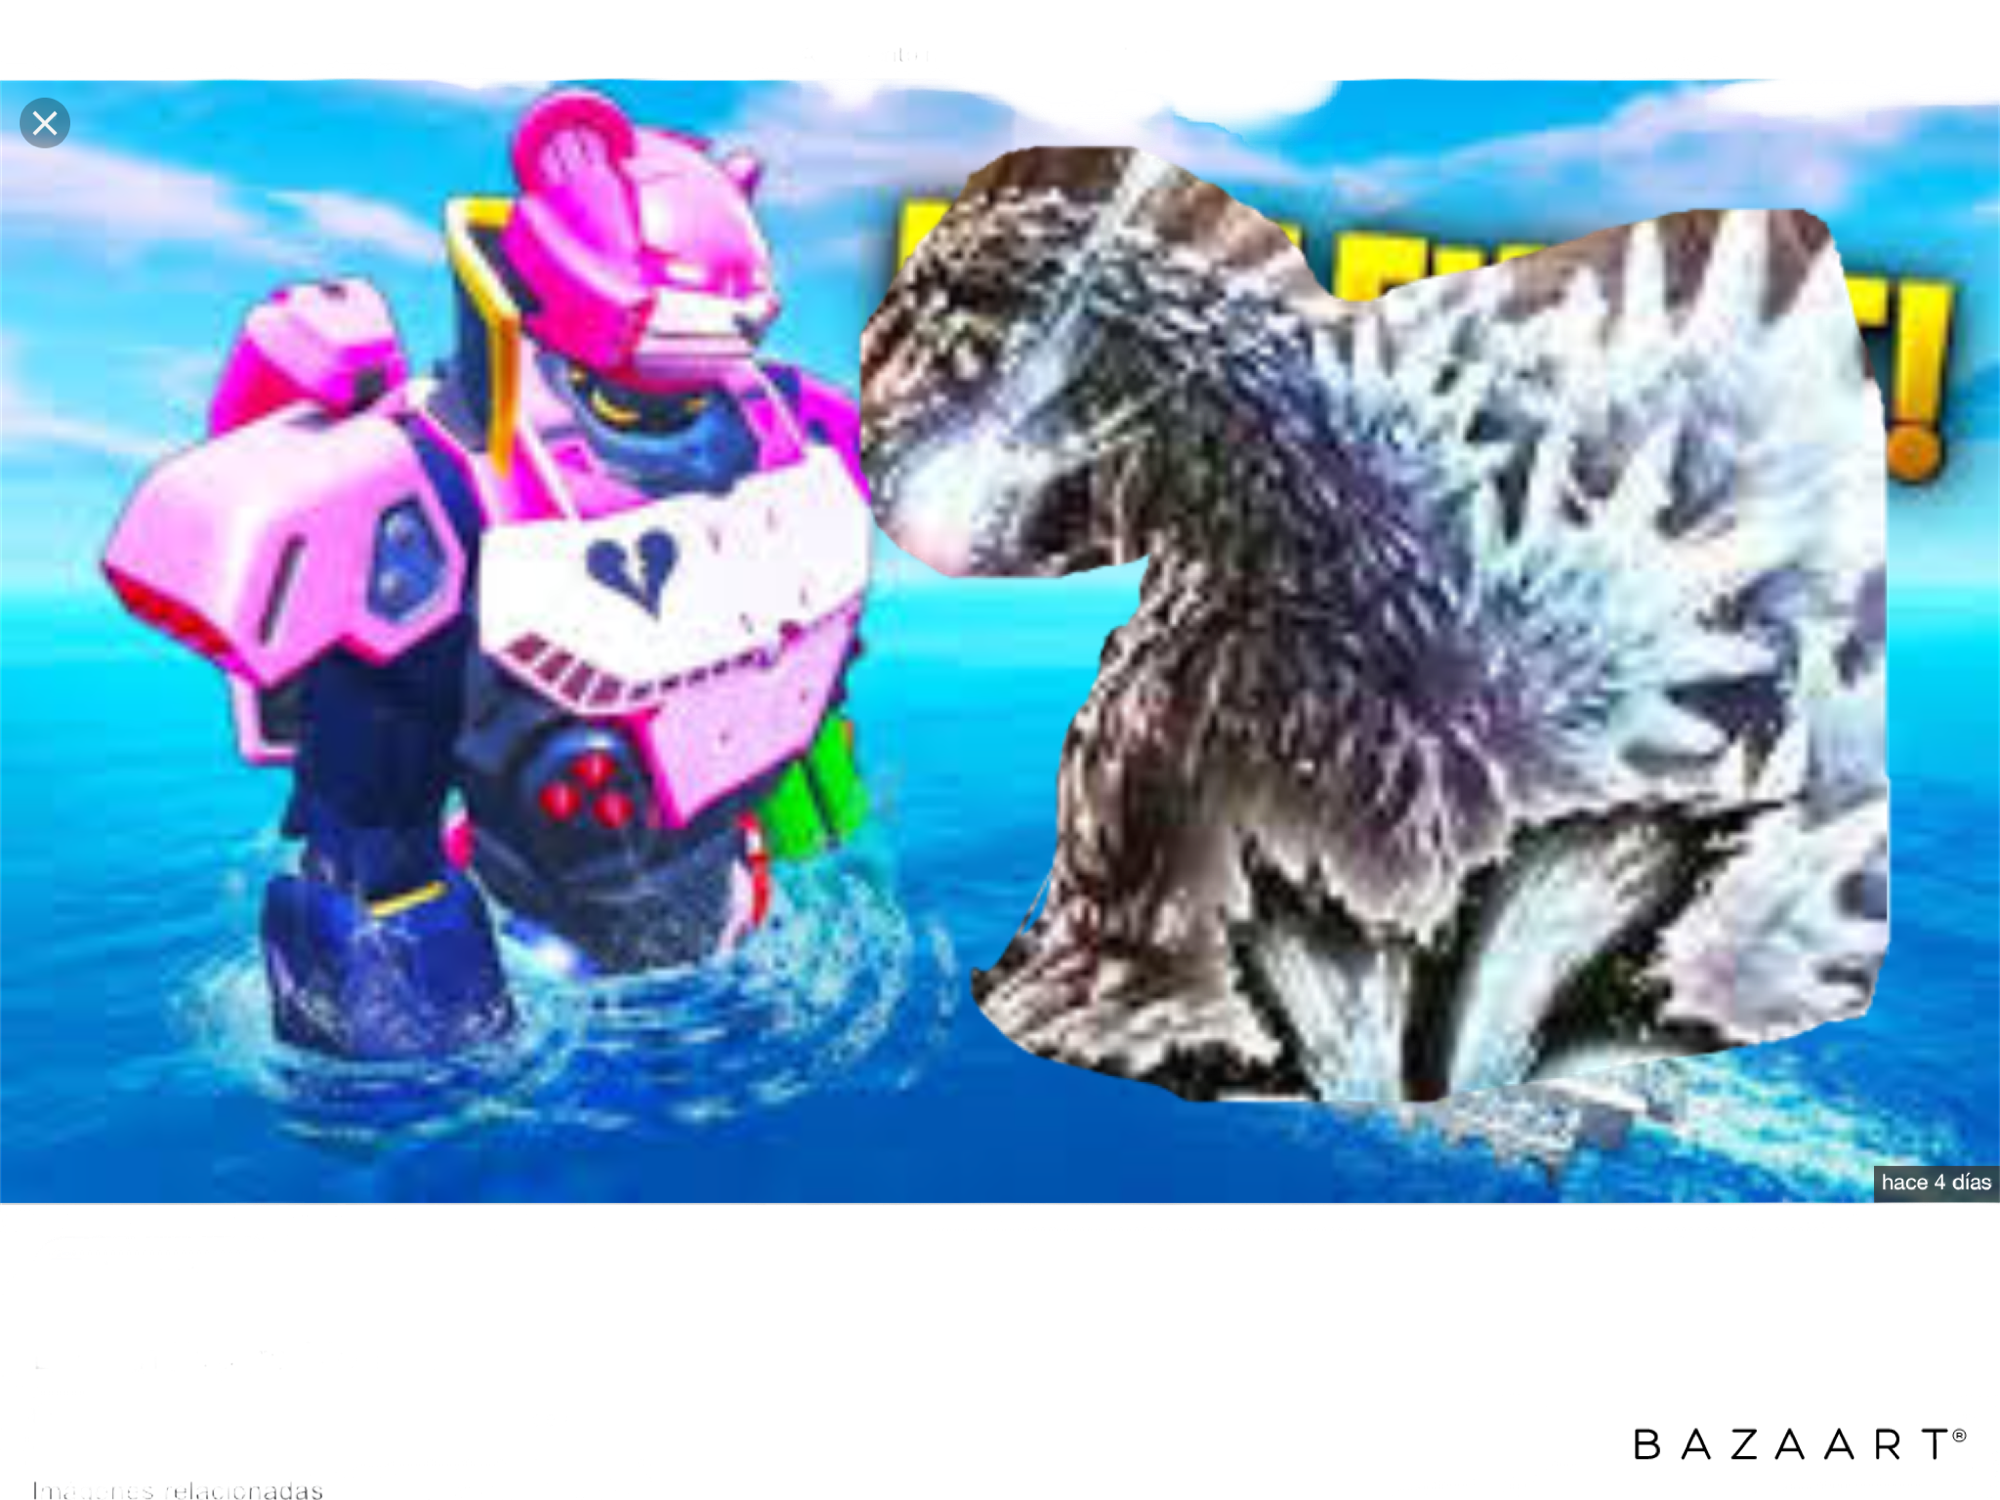 Esto hubiera pasado o si Fortnite hubiera hecho un trato con Godzilla